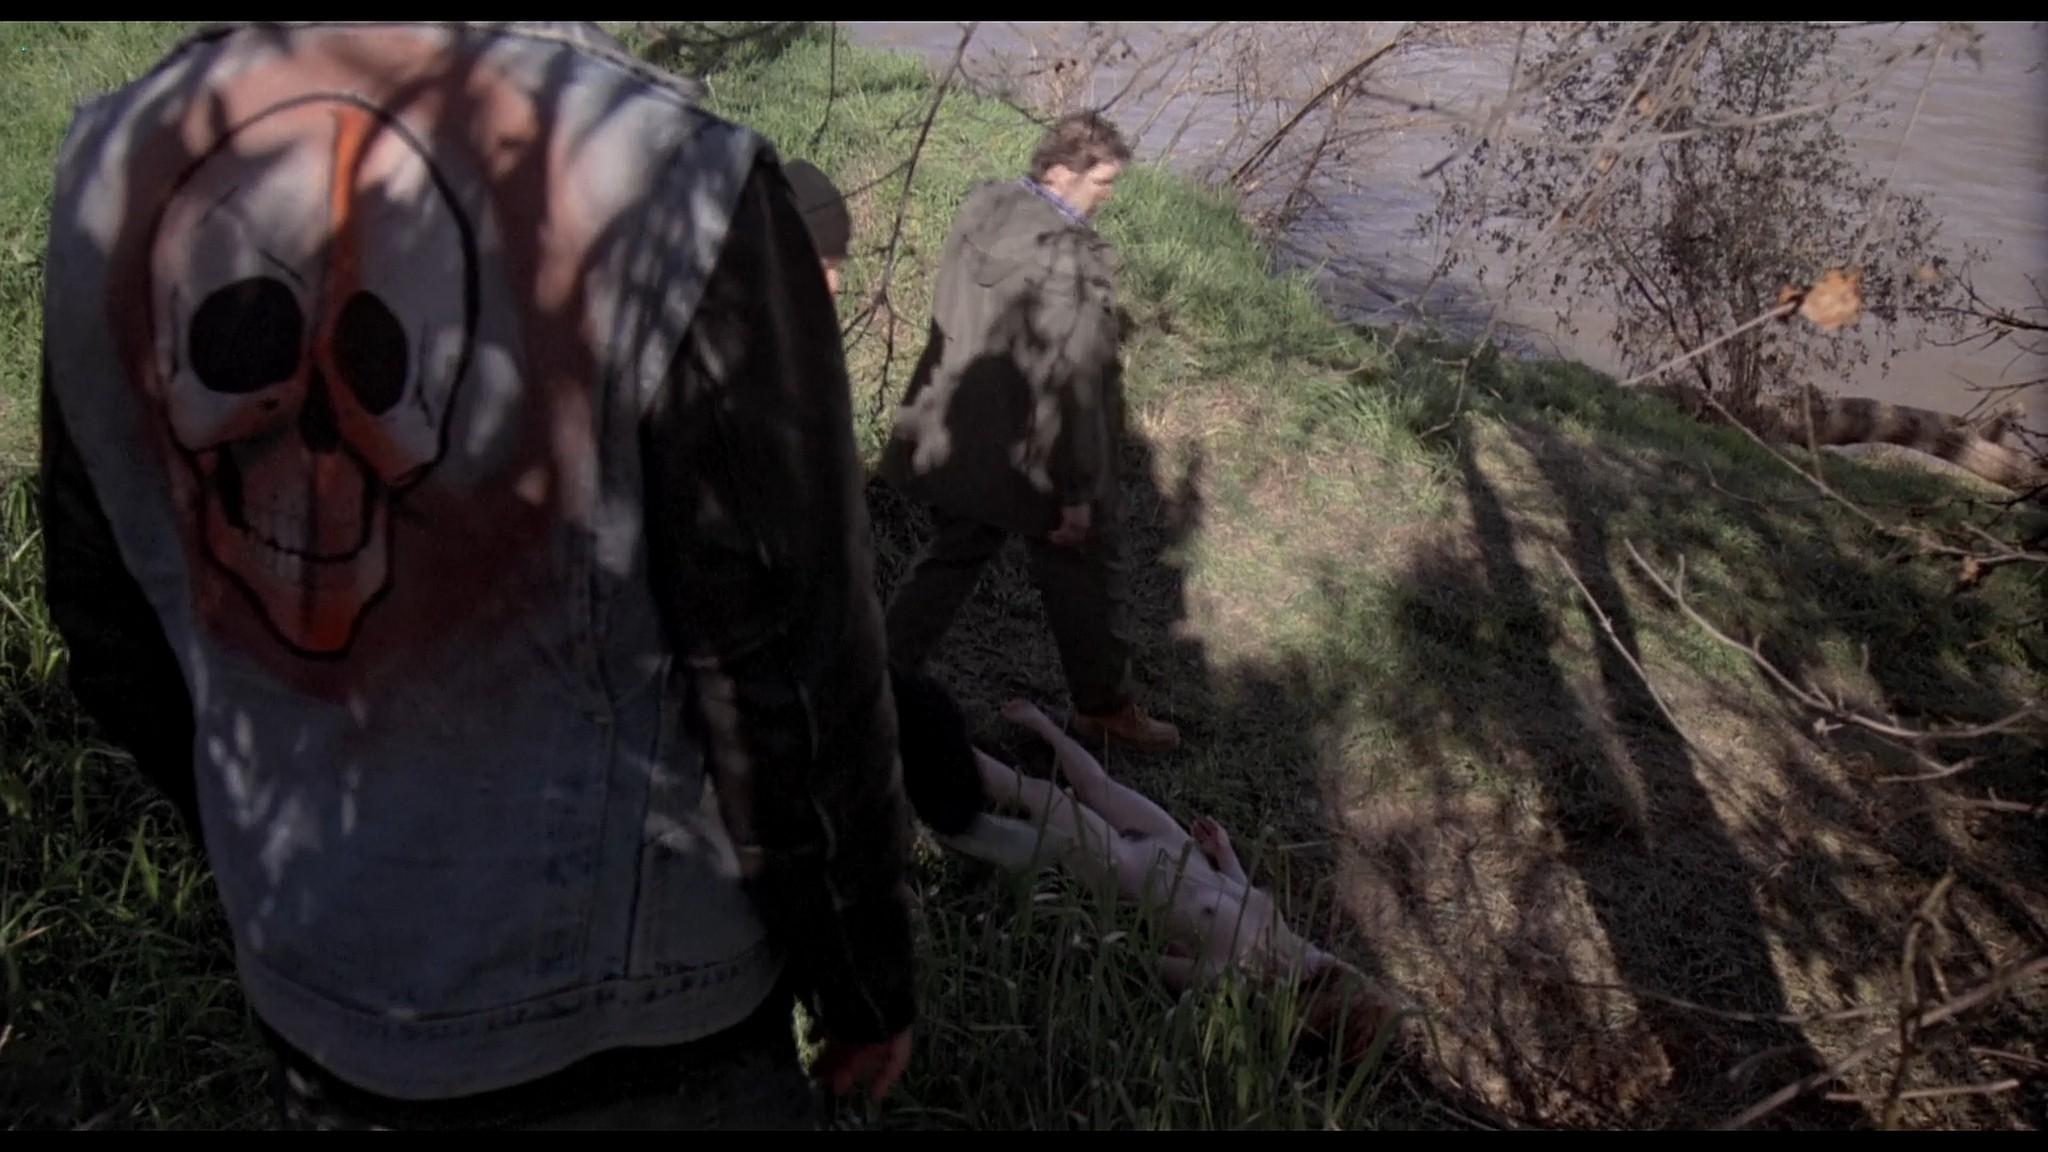 Danyi Deats nude bush topless but dead Rivers Edge 1986 HD 1080p BluRay 11